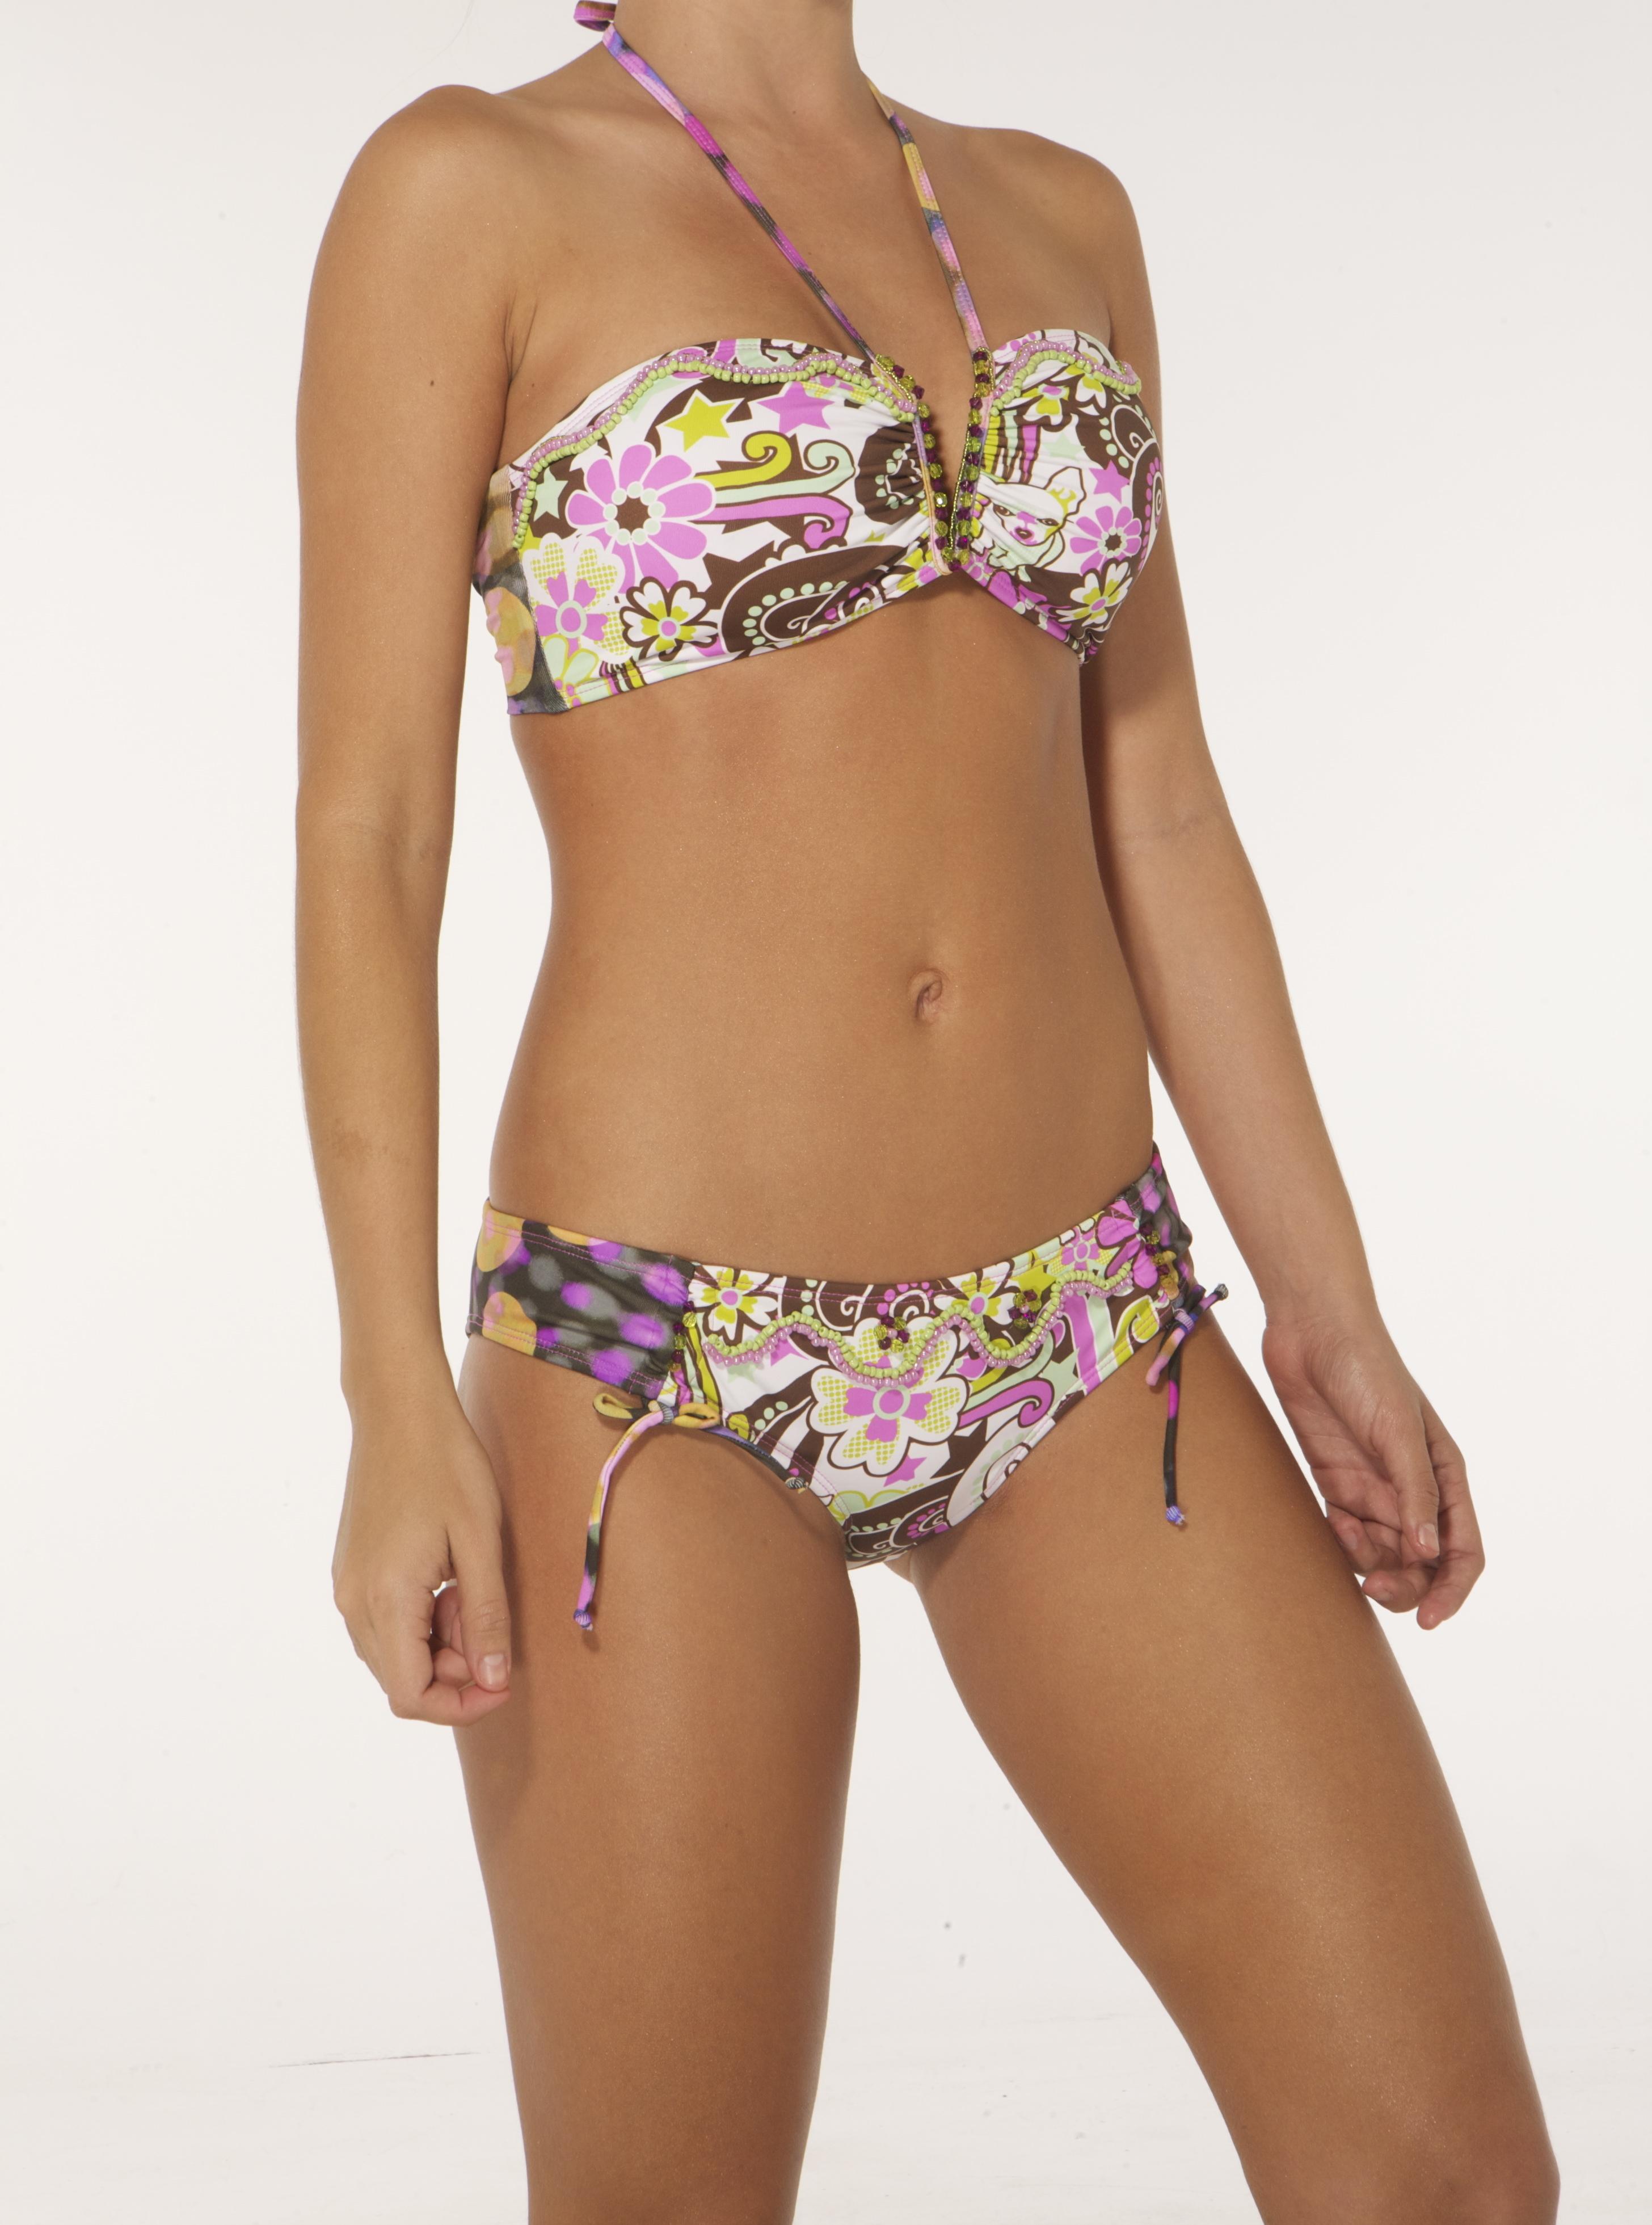 Paradizia Swimwear: Pink Crystal Bandeau (Shown with matching Hipkini)